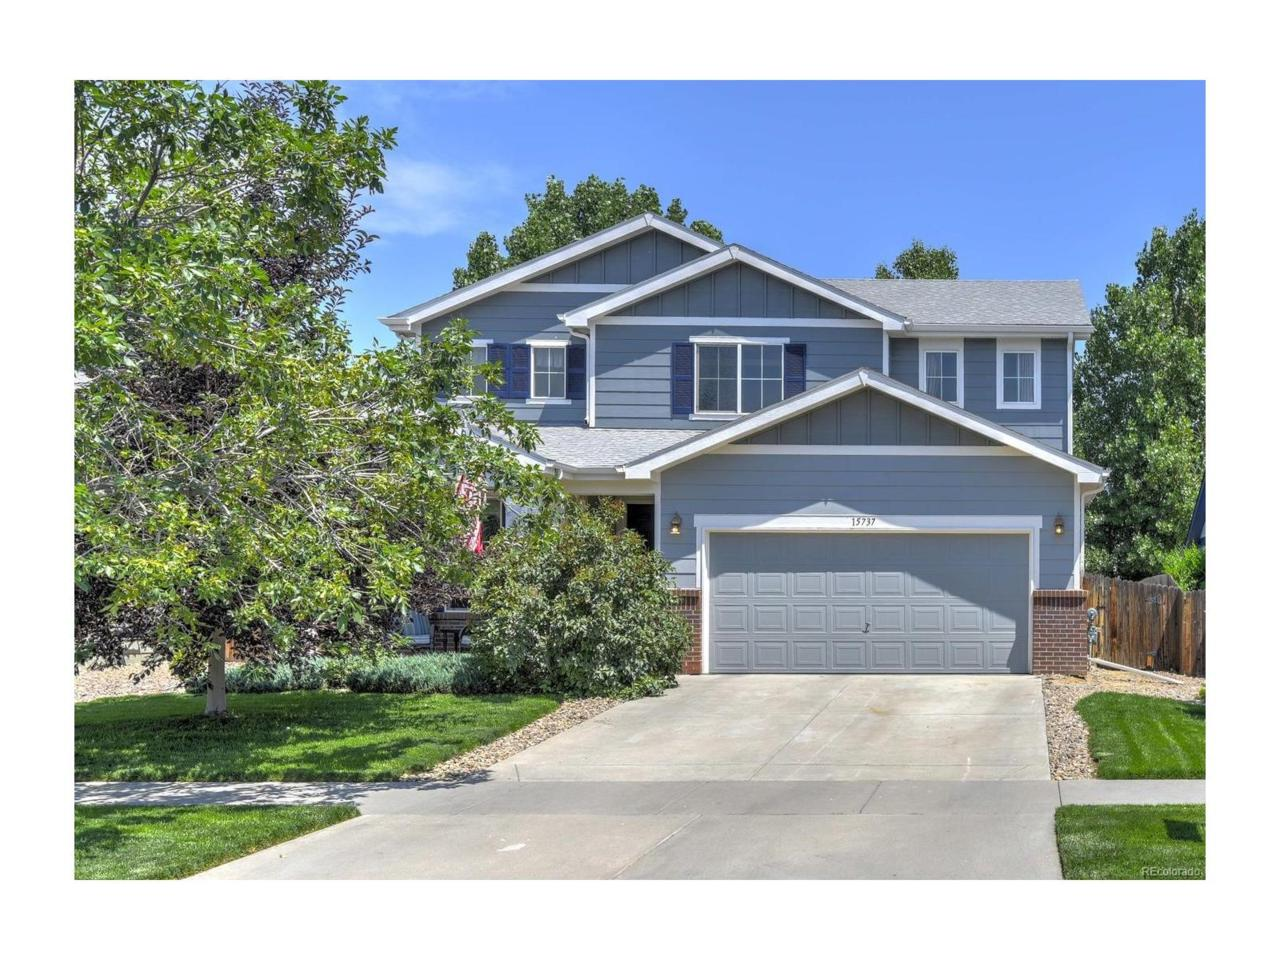 15737 Randolph Place, Denver, CO 80239 (MLS #5308763) :: 8z Real Estate